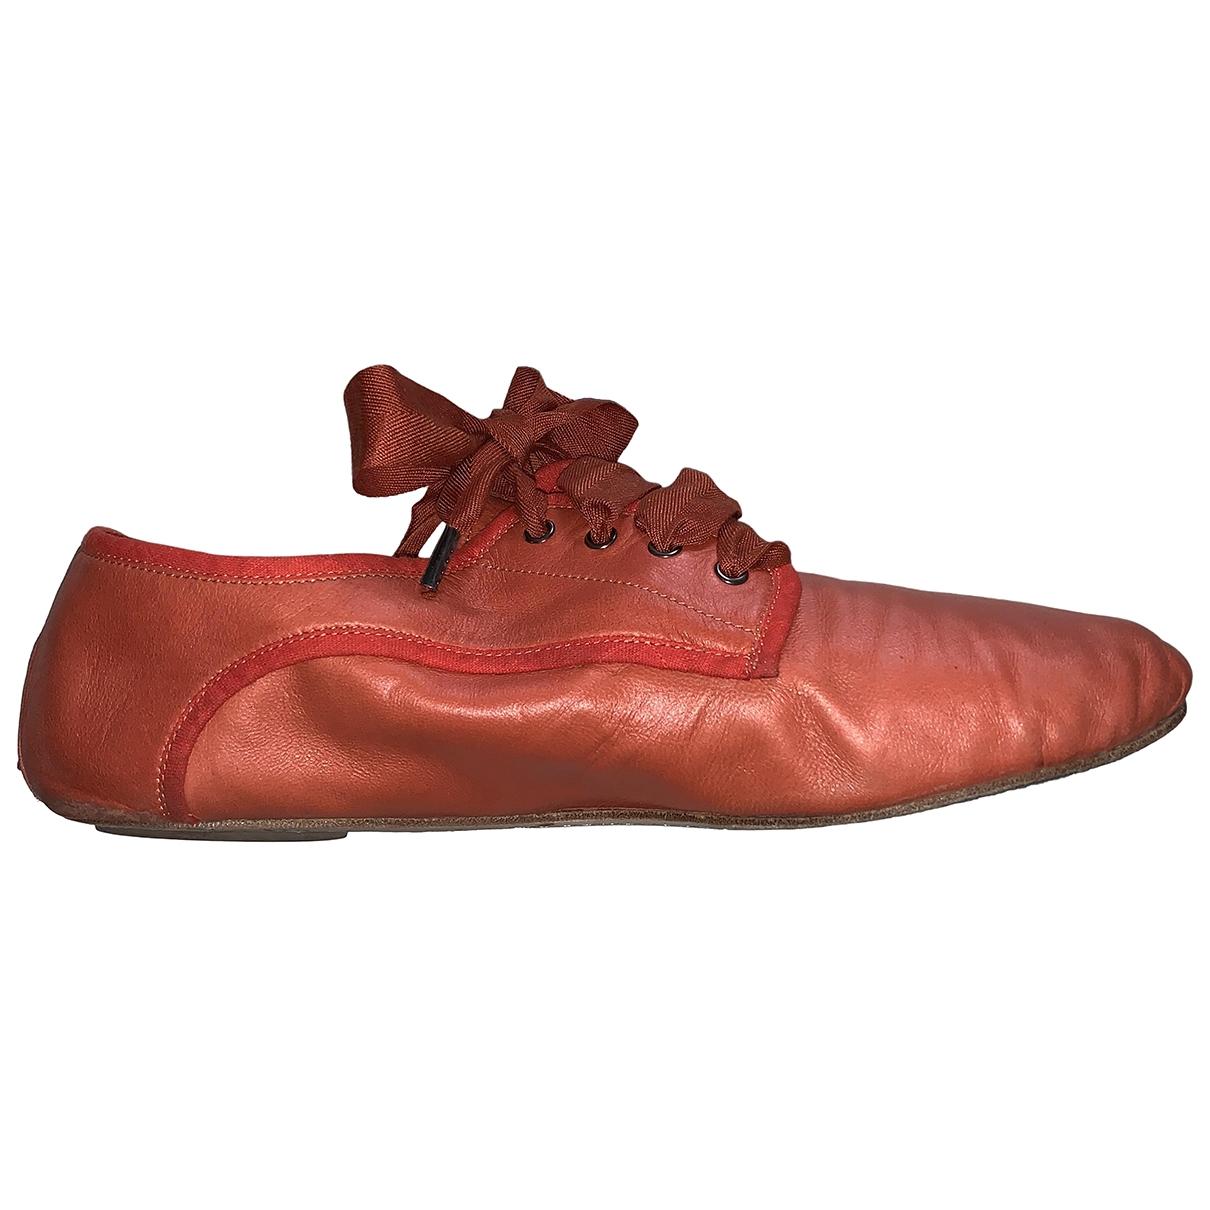 Chloé \N Orange Leather Lace ups for Women 39 EU